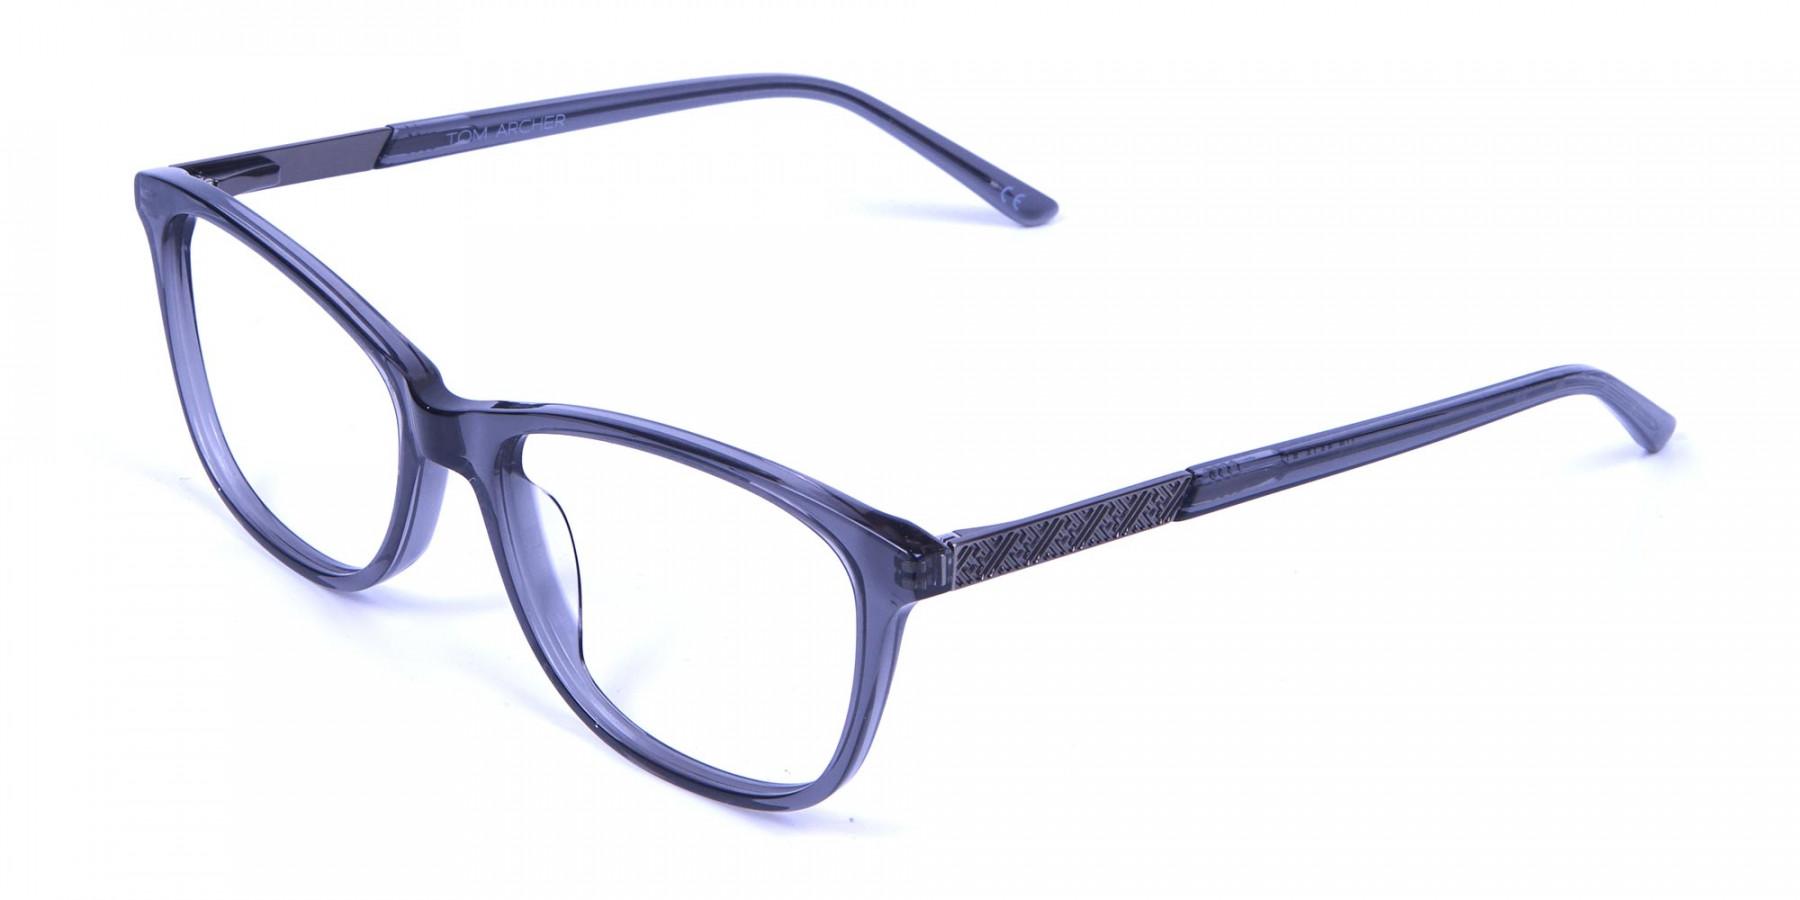 Glasses In Oriental Style